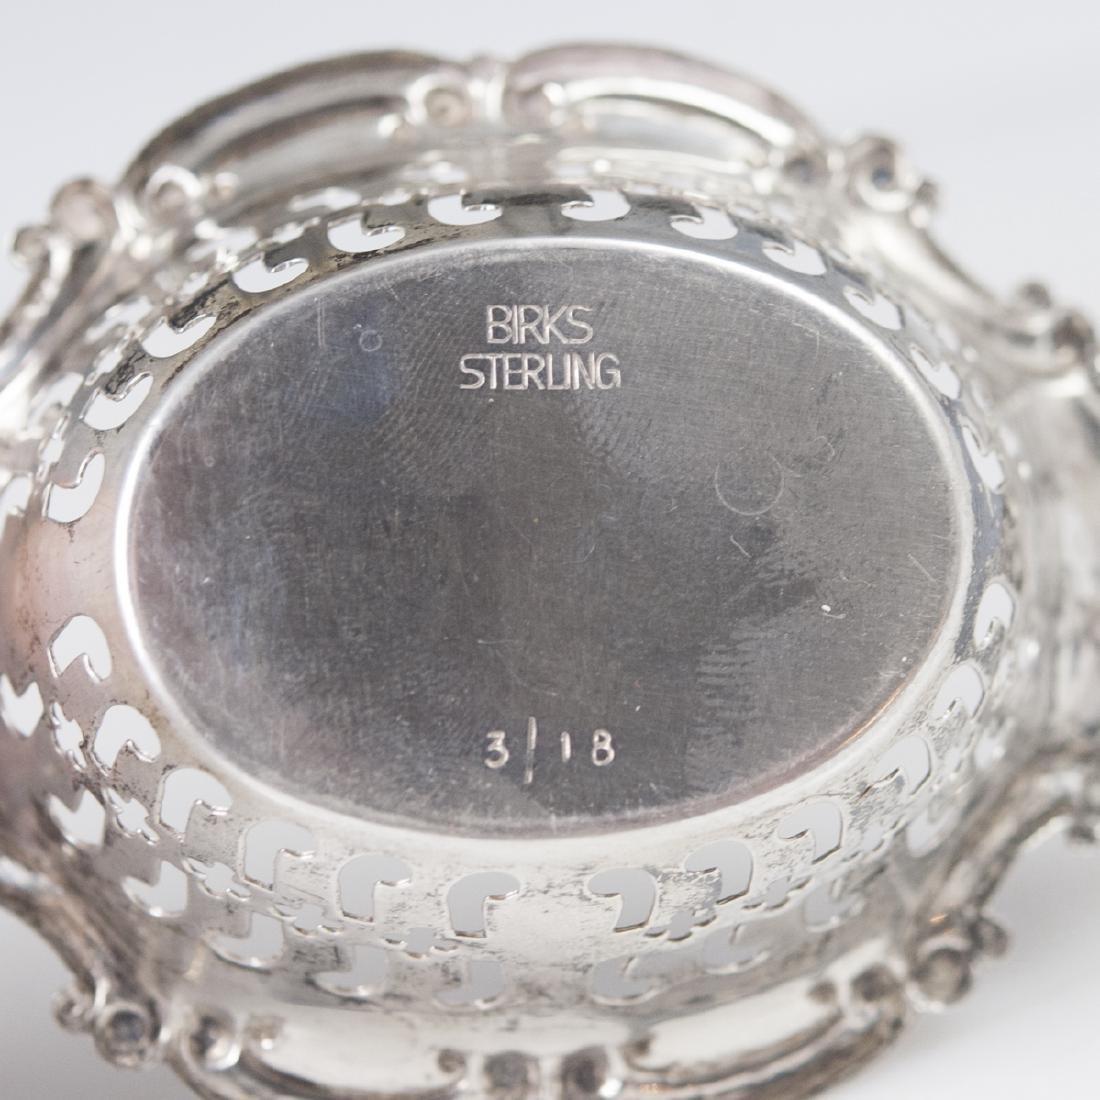 Birks Sterling Nut Dish - 3